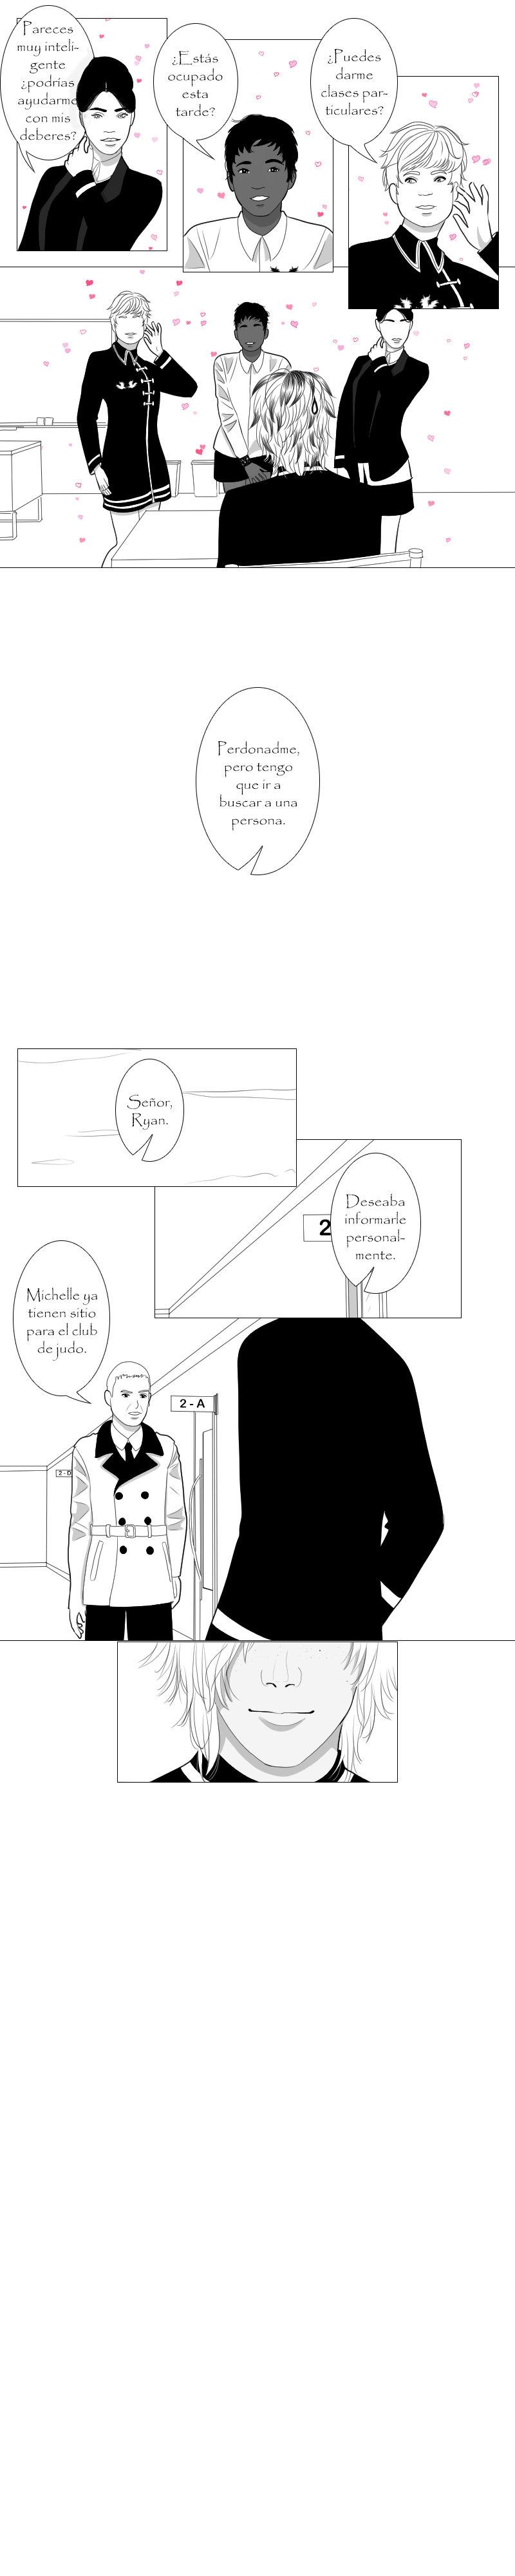 https://nine.mangadogs.com/es_manga/pic8/27/34331/955771/407a679684c70f3c24afe6d1b2c49cc7.jpg Page 1